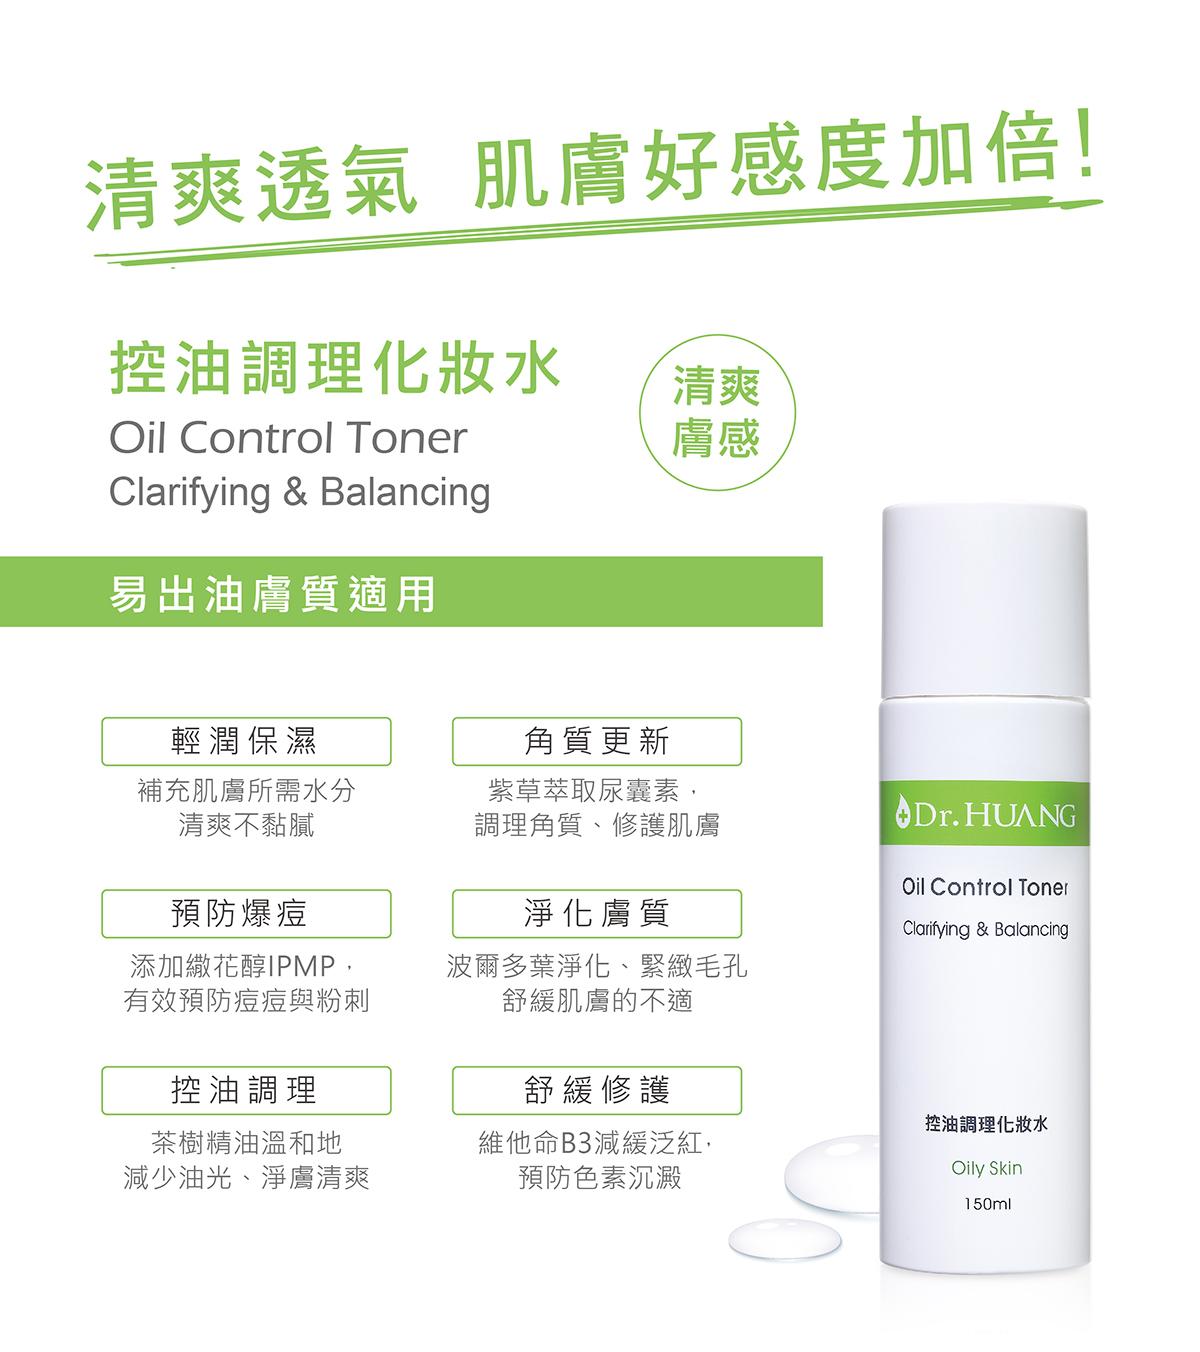 Dr.HUANG控油化妝水清潤保濕角質更新預防爆痘淨化膚質控油調理舒緩修護